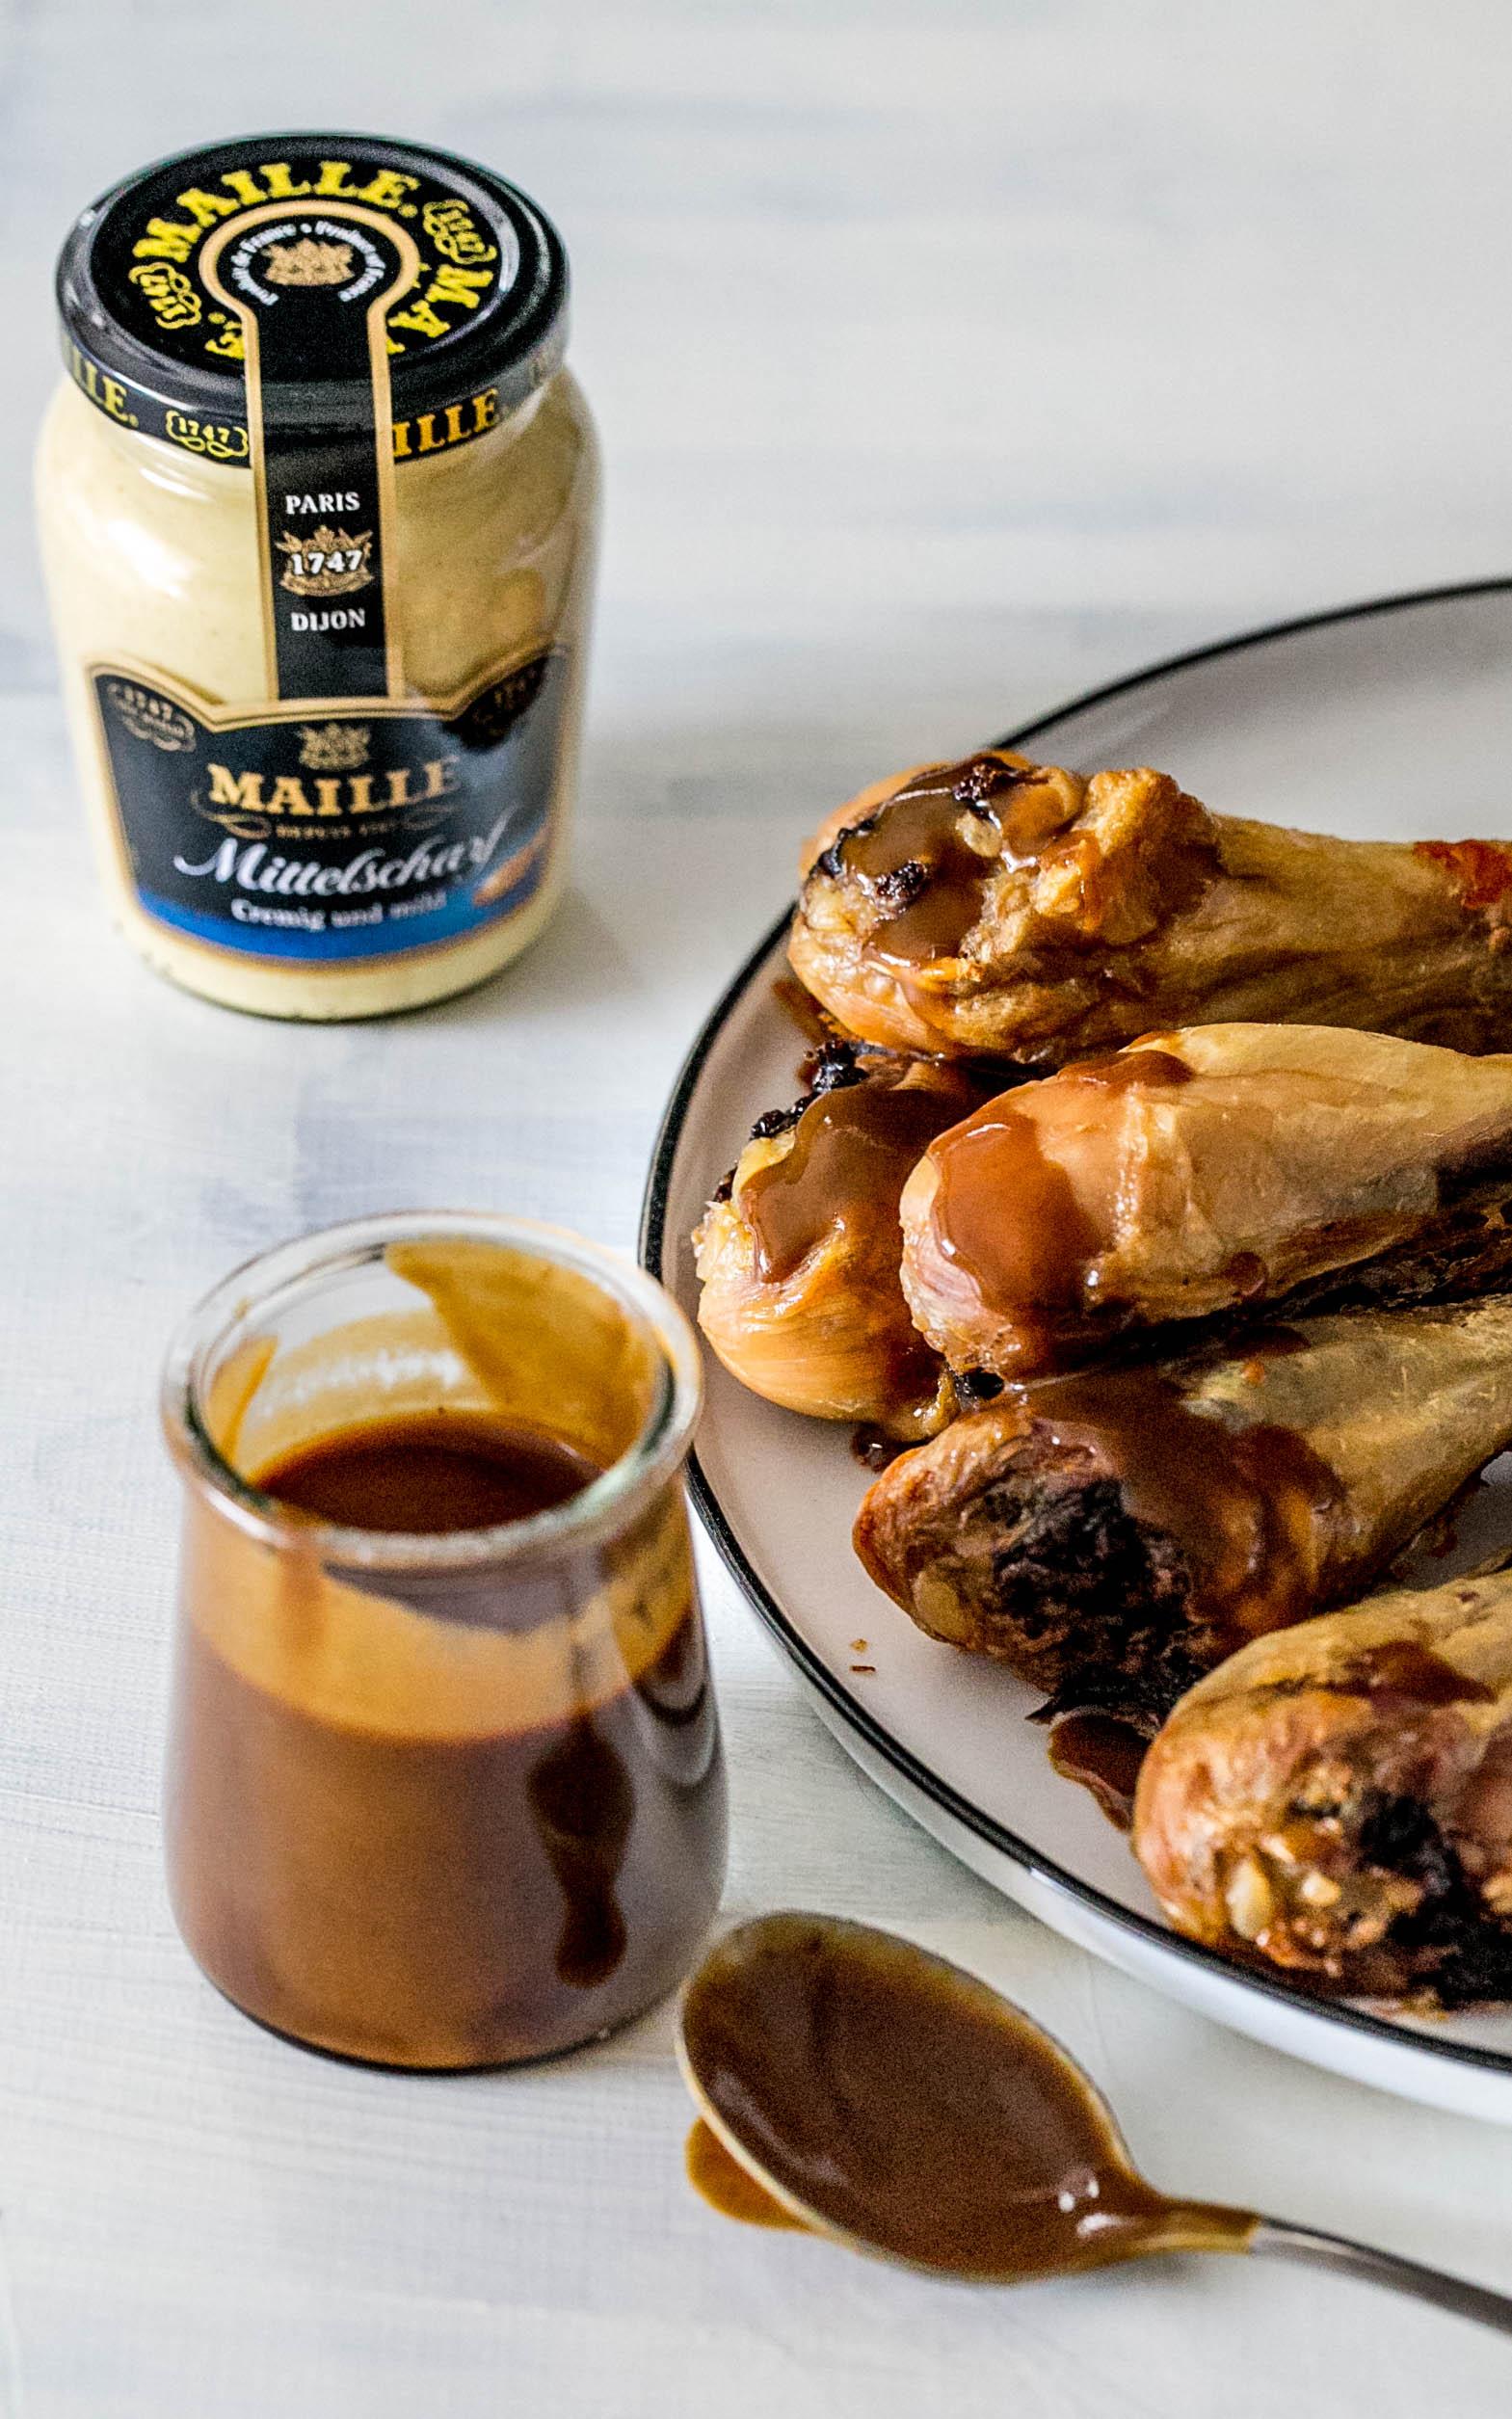 BBQ-Senf-Sauce